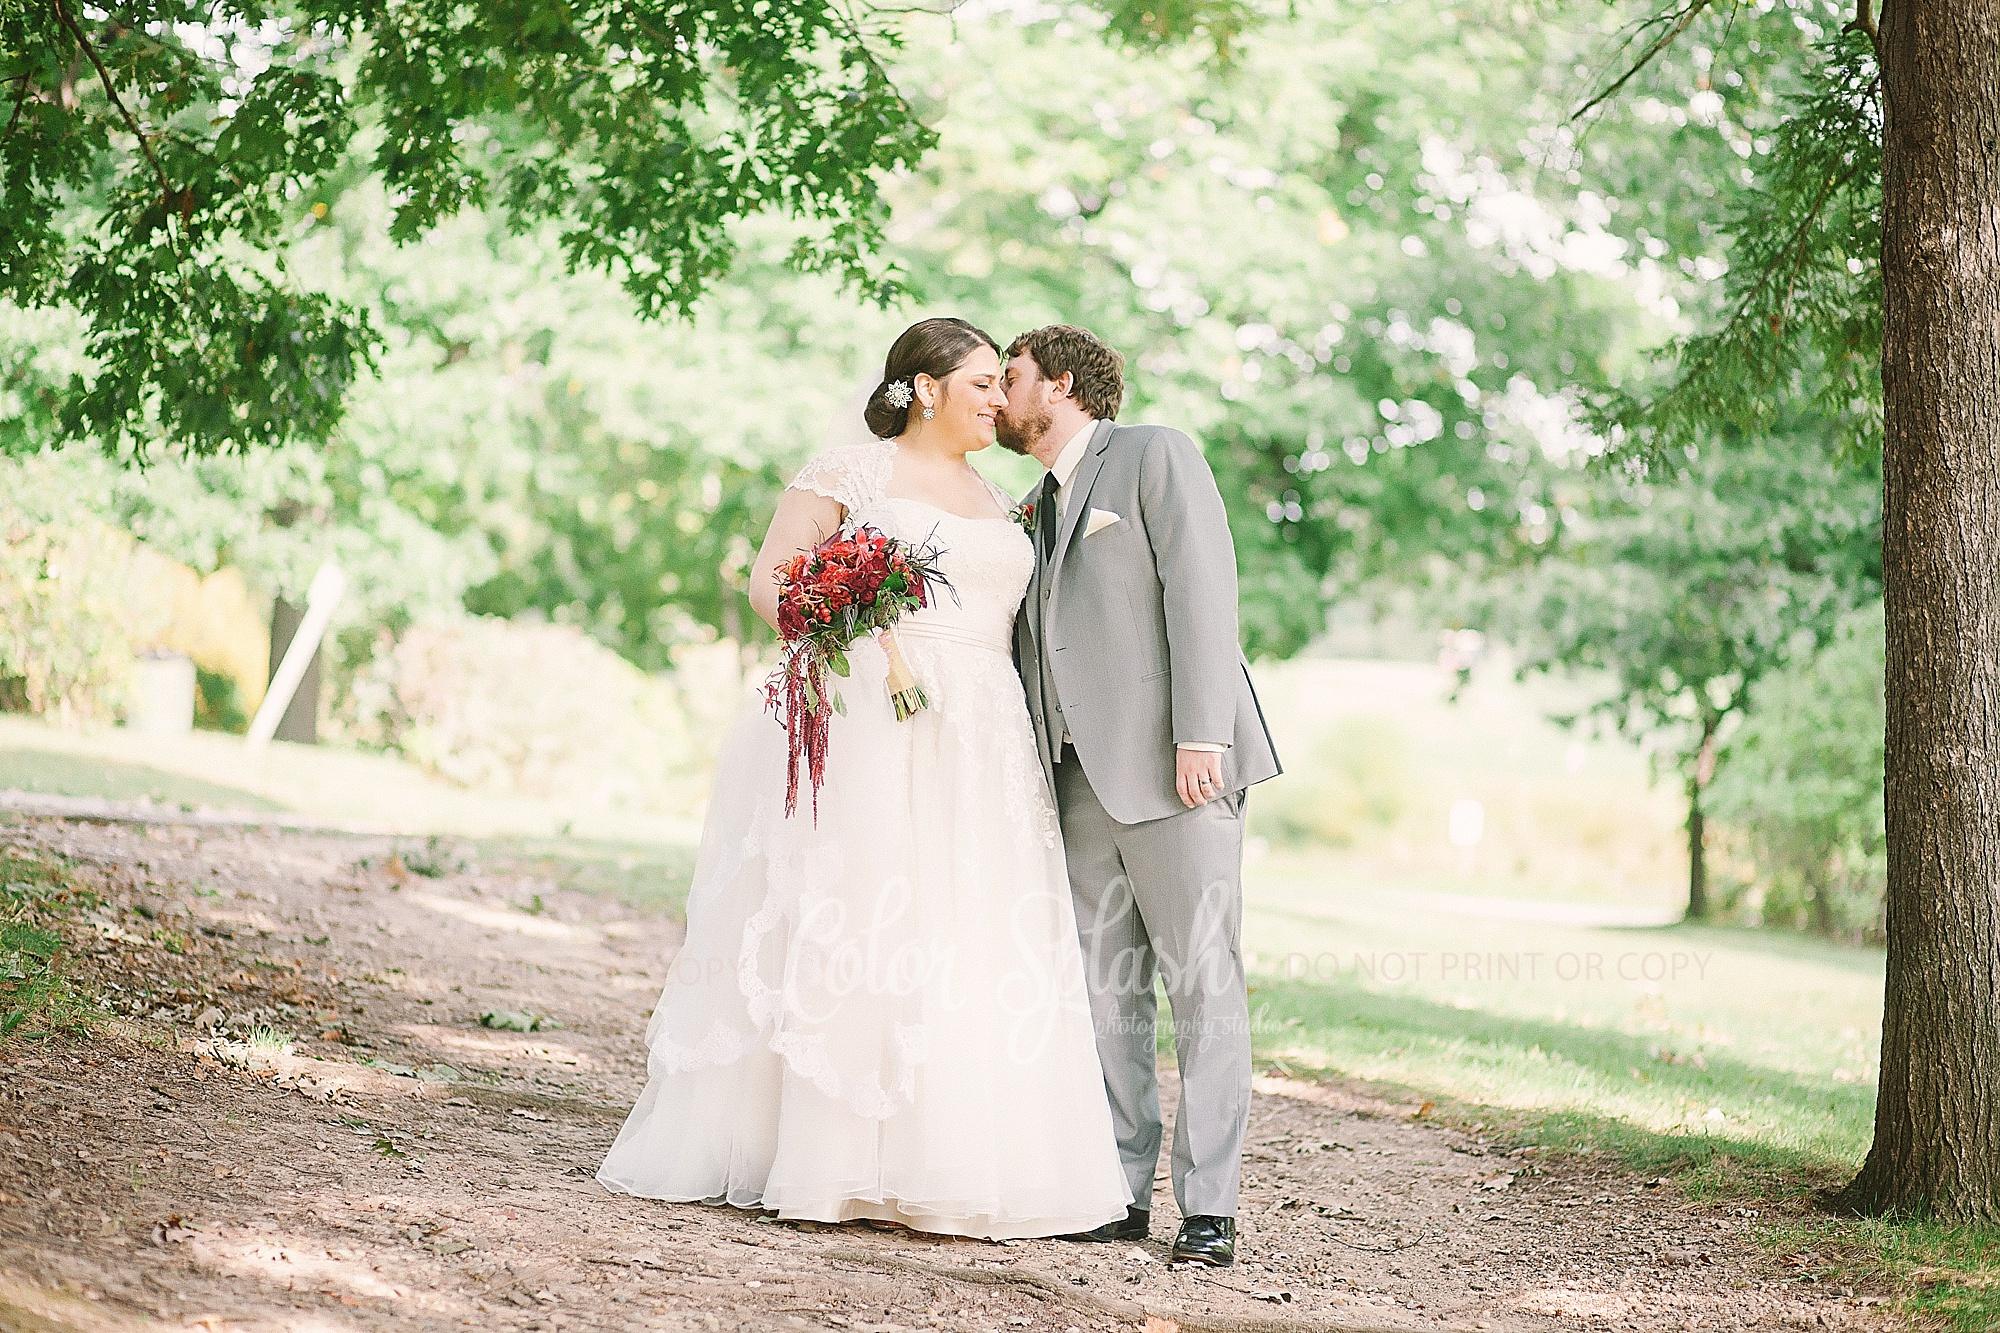 stetston-chapel-cityscapes-wedding-kalamazoo_0301